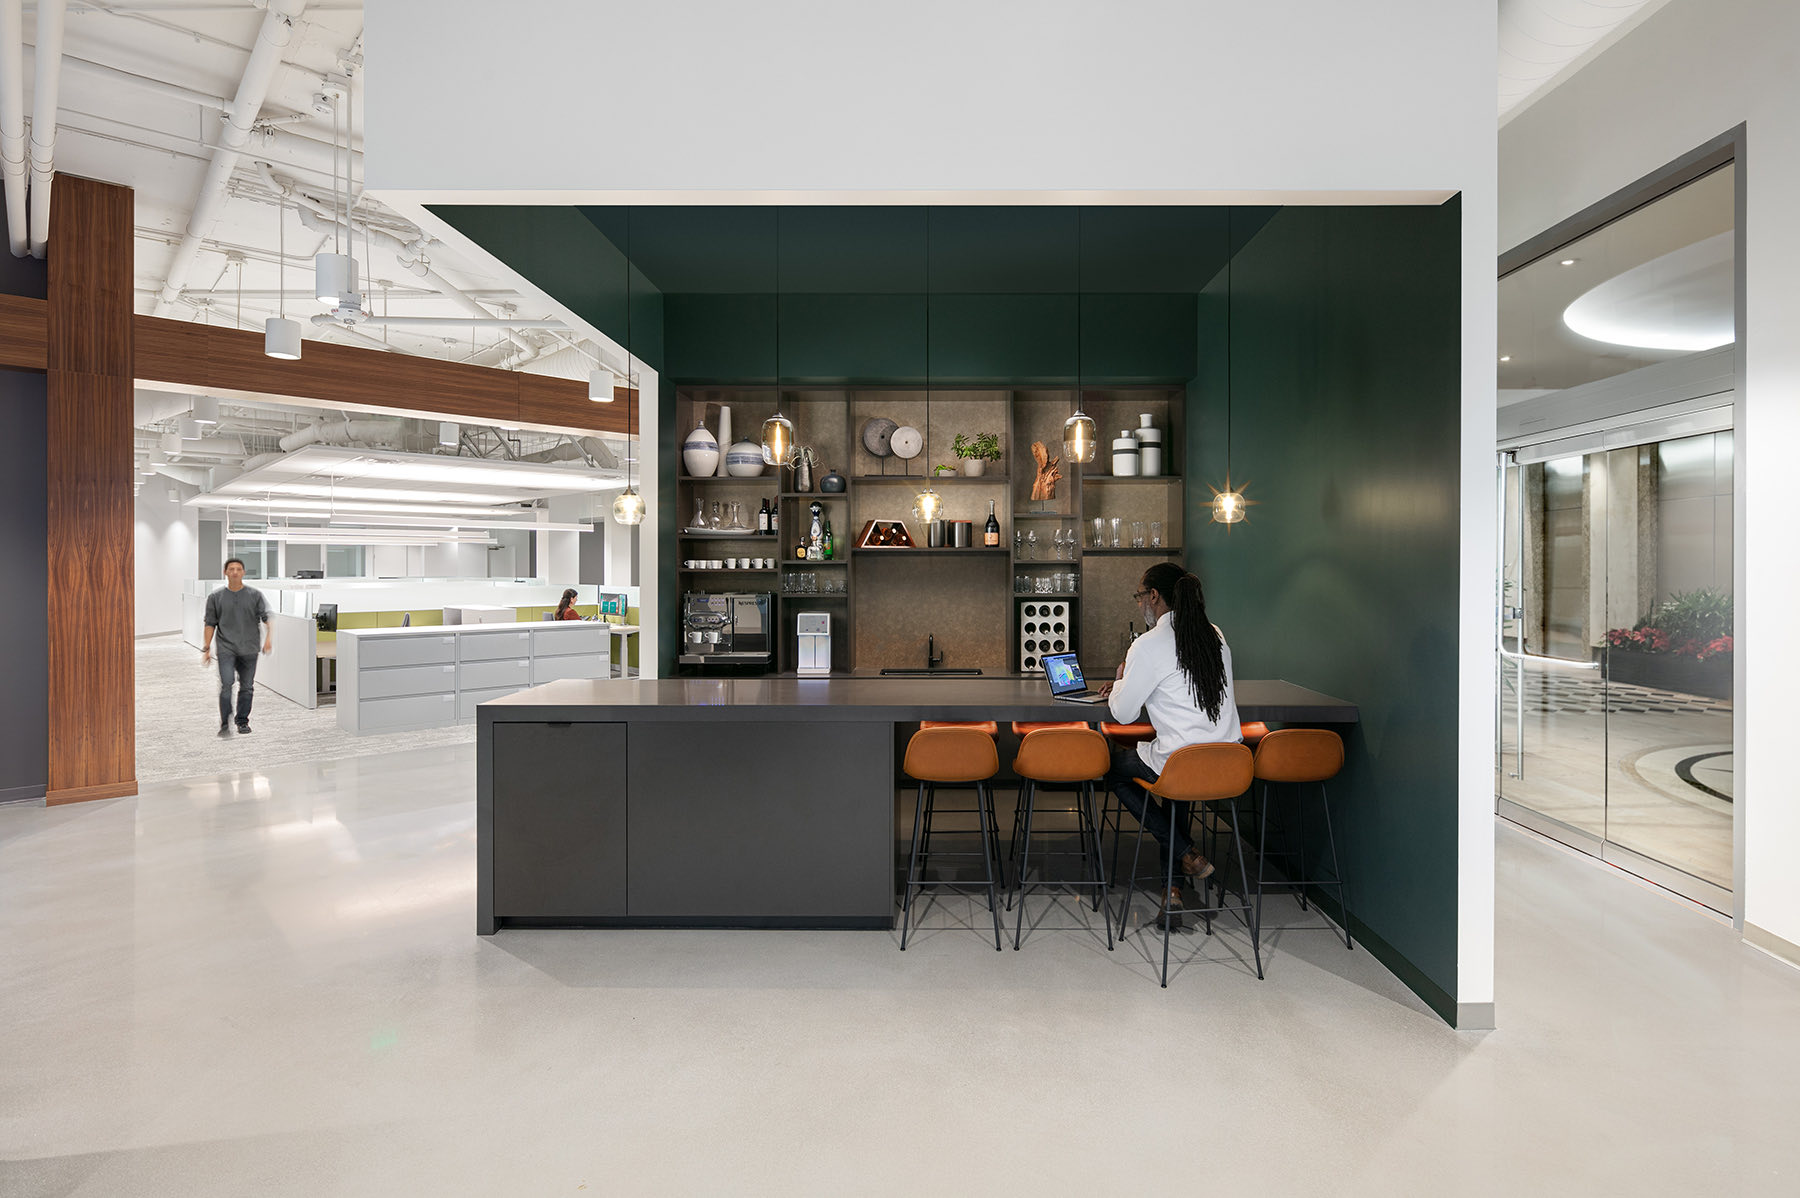 A Look Inside Prologis' New El Segundo Office